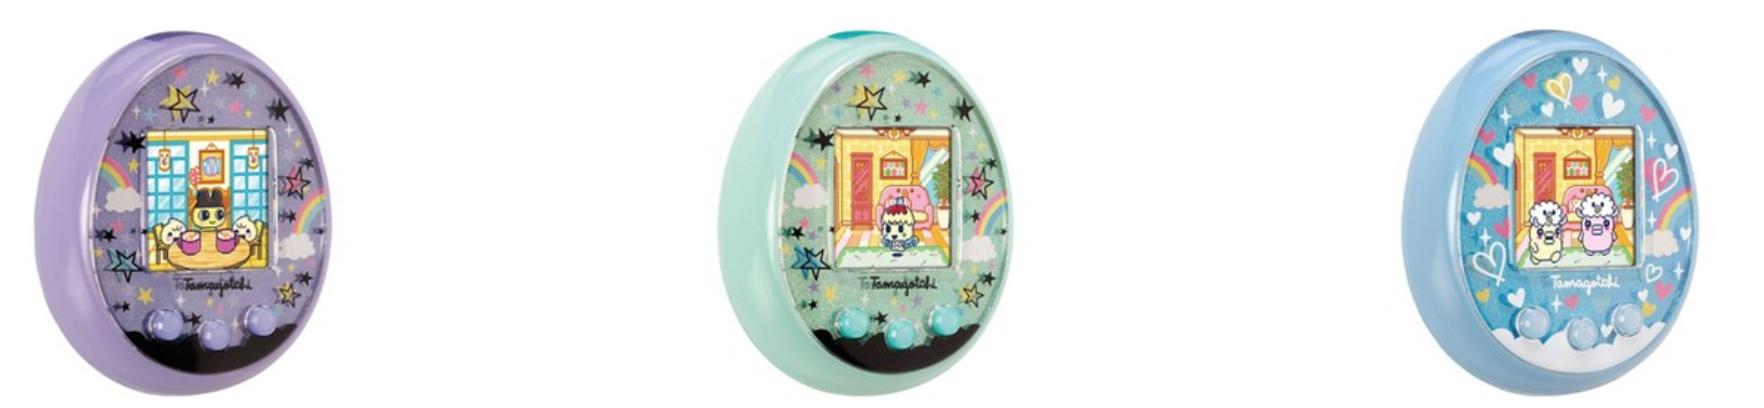 Fairy themed Tamagotchi On virtual pet.